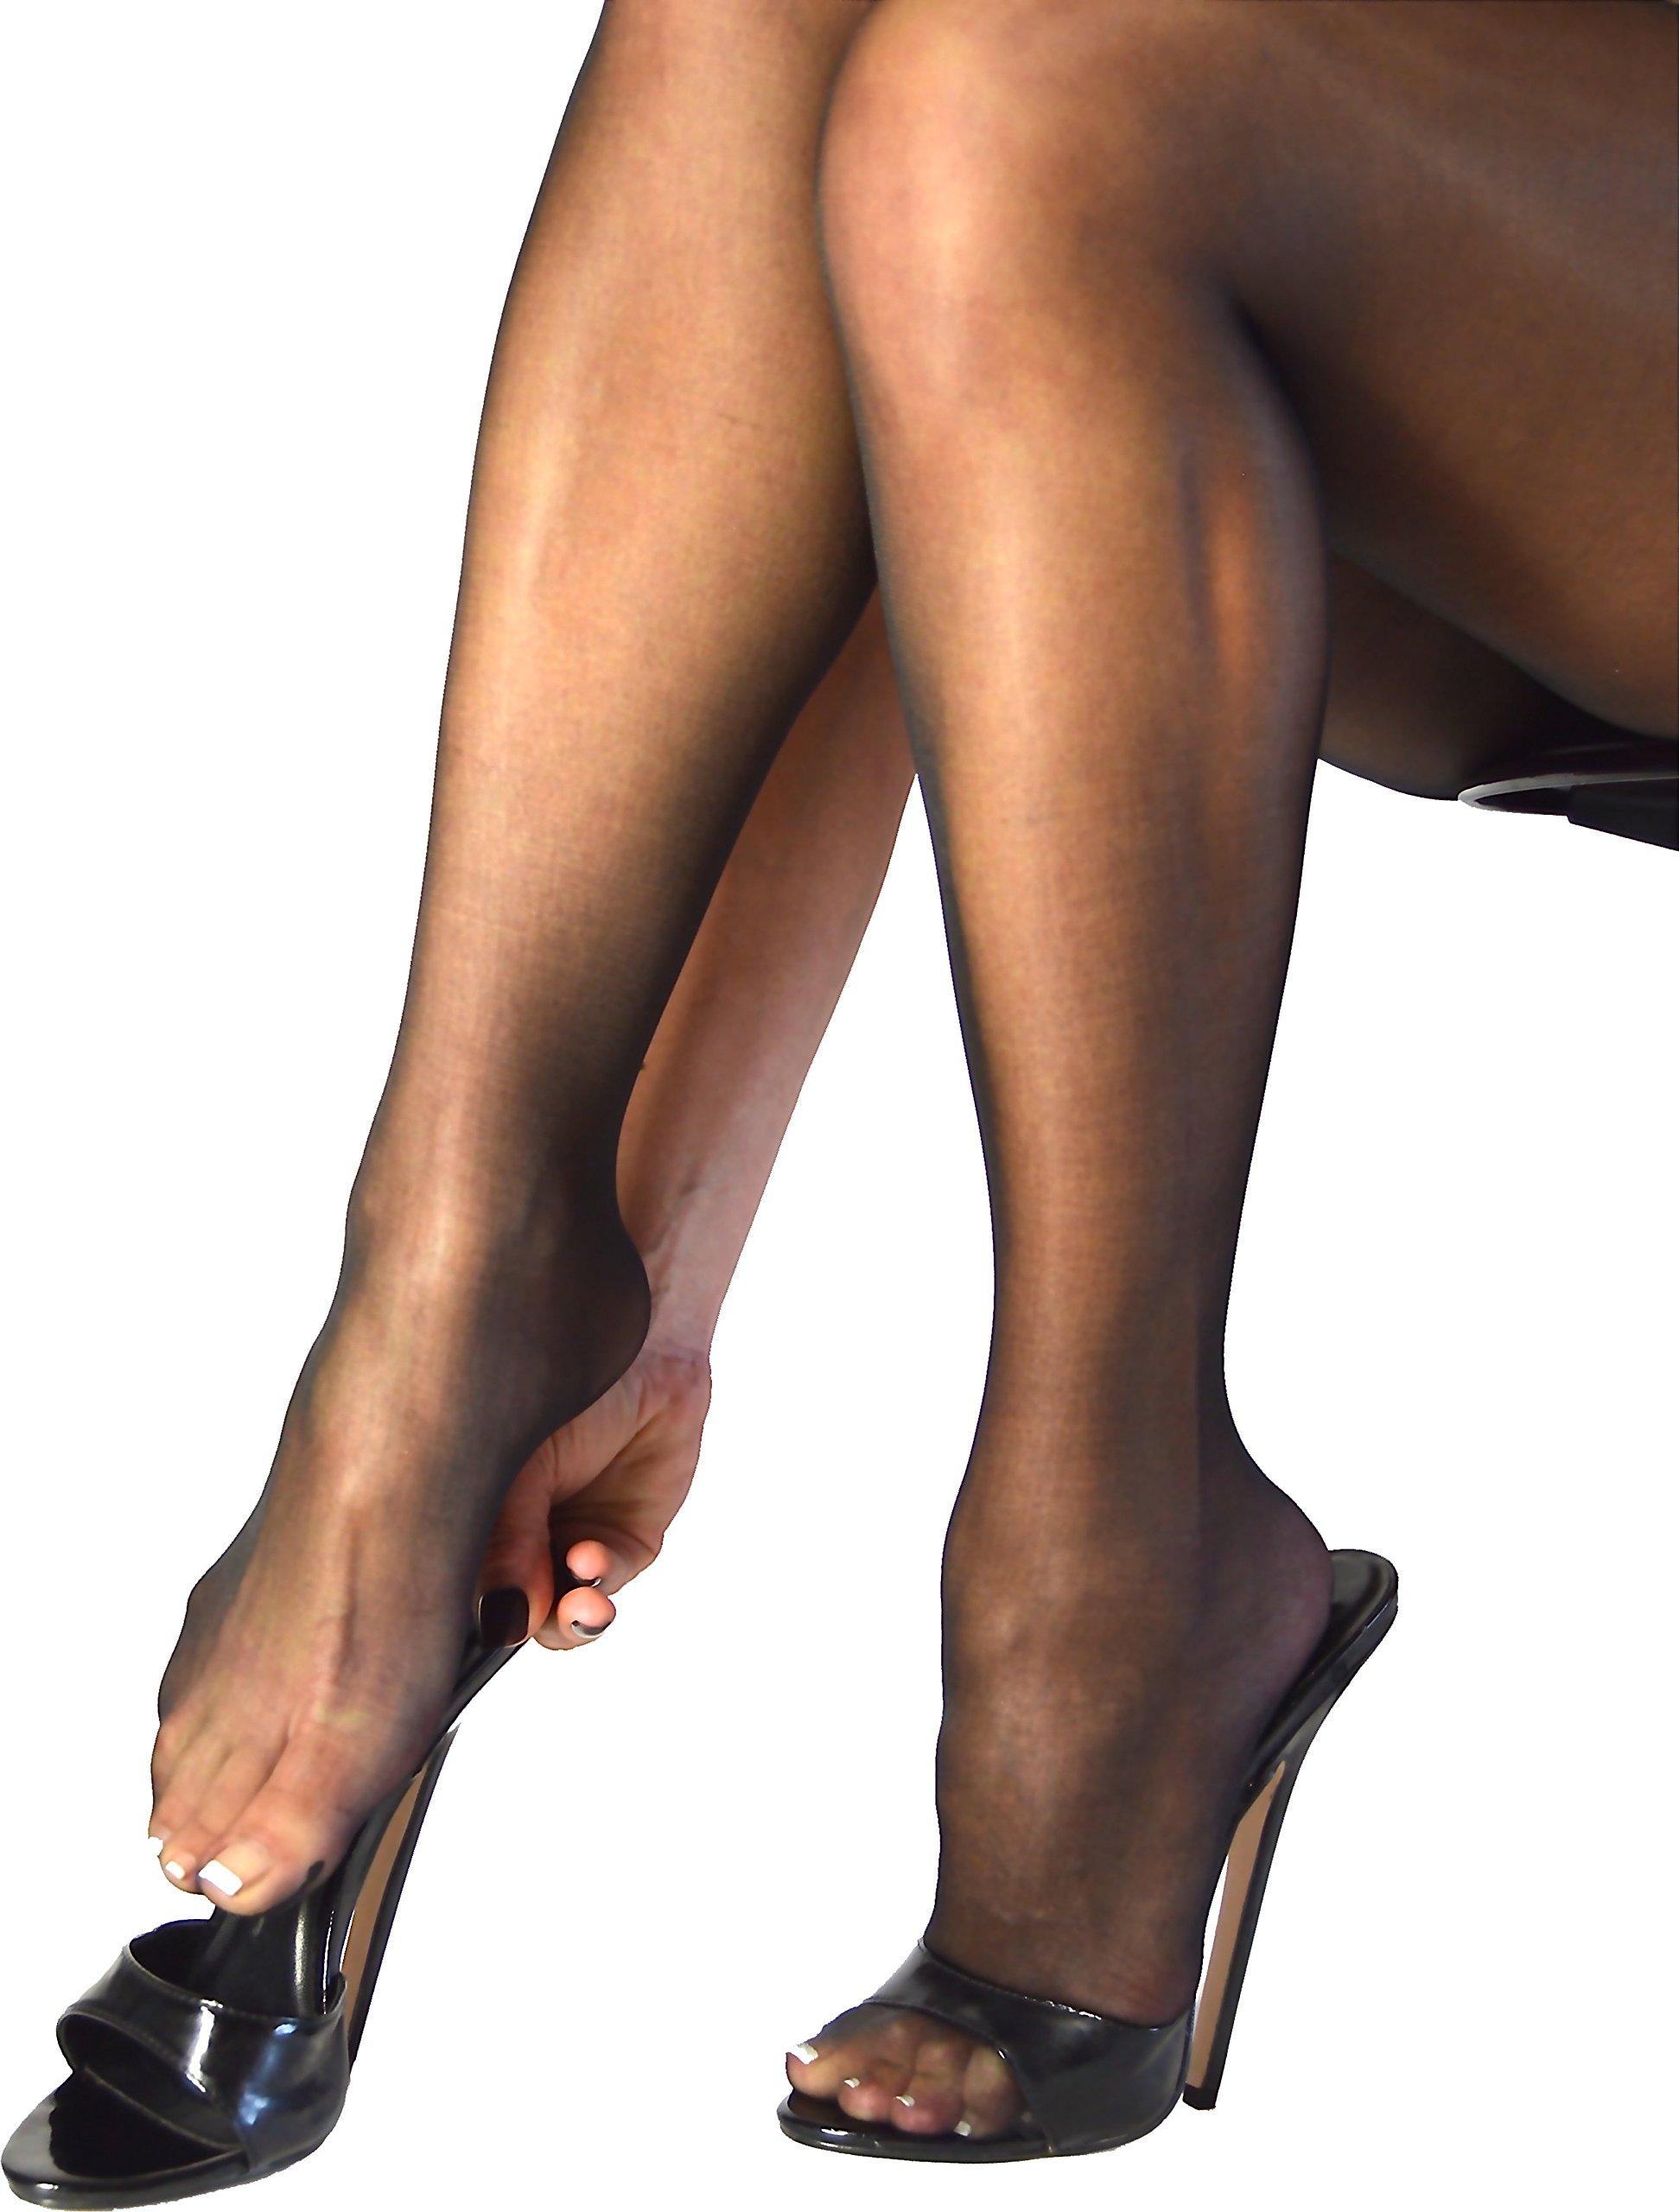 Sphynx - Open Gusset Wet Look Pantyhose sheer transparent sandal foot (Black)